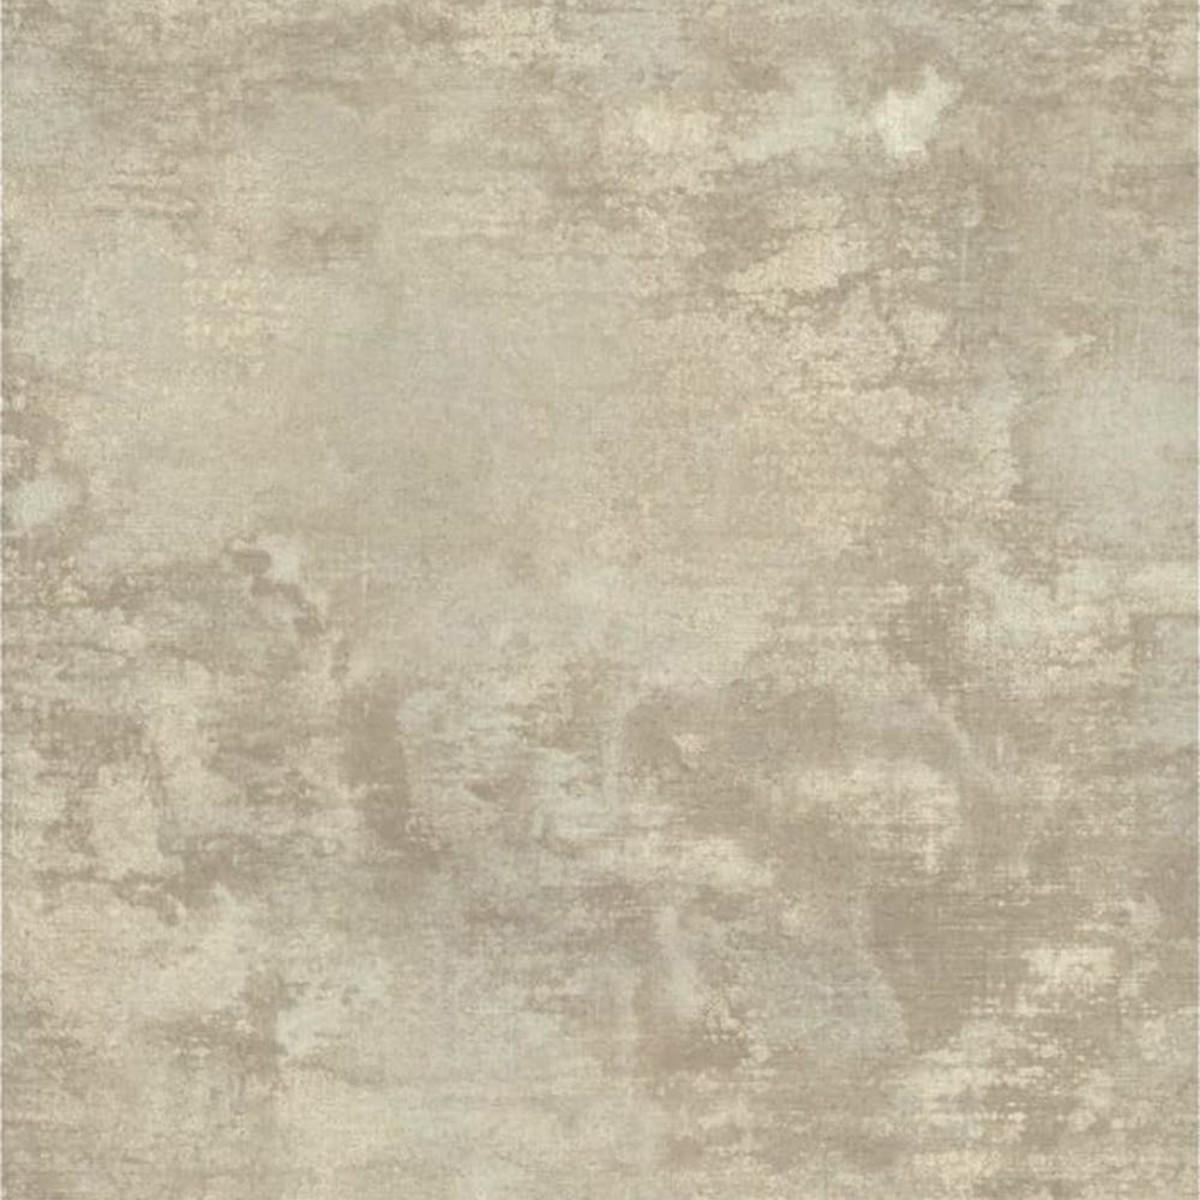 Обои флизелиновые Parato Concetto серые 0.70 м 9881